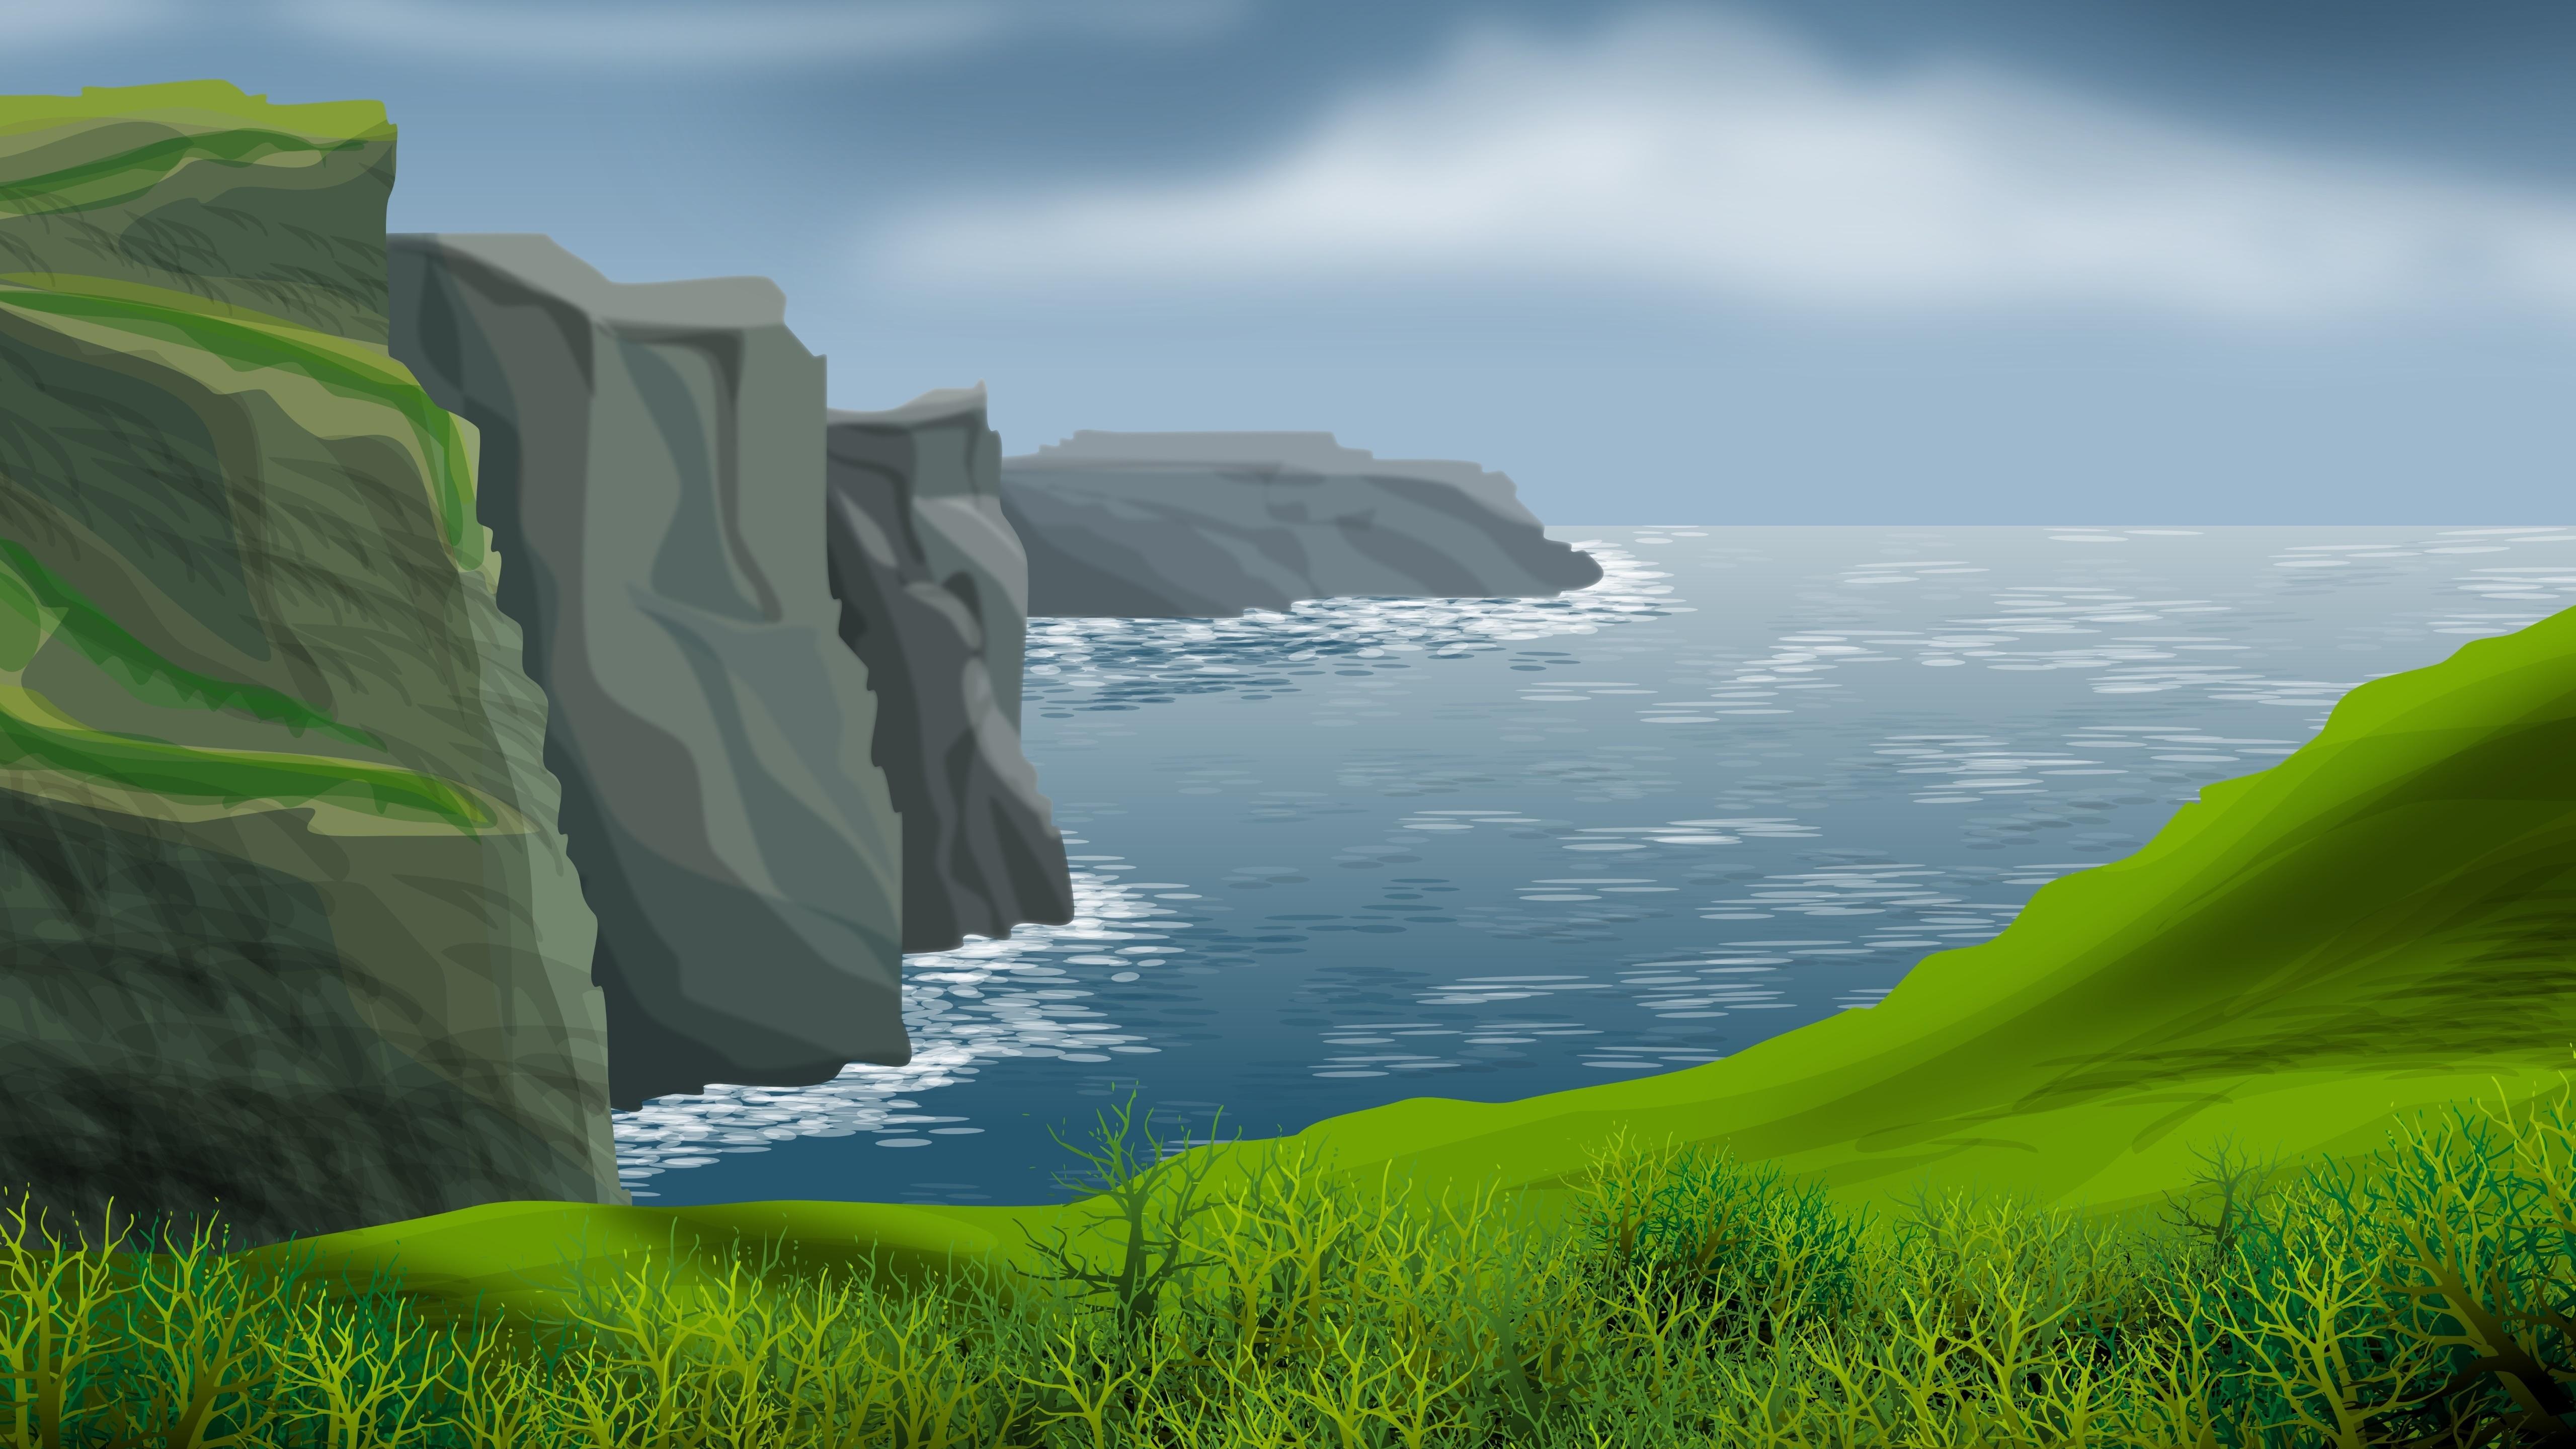 Digital seascape wallpaper